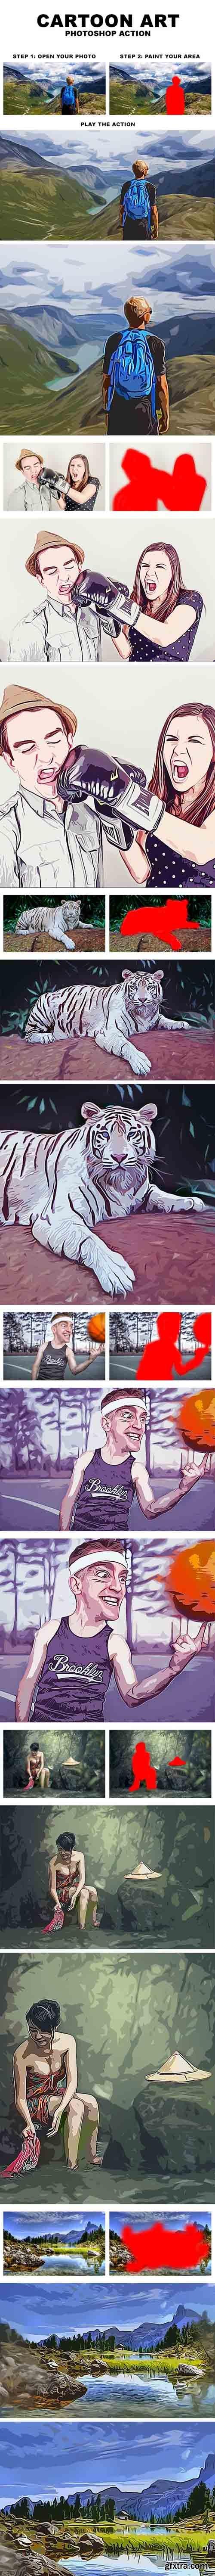 Graphicriver - Cartoon Art Photoshop Action 20203842